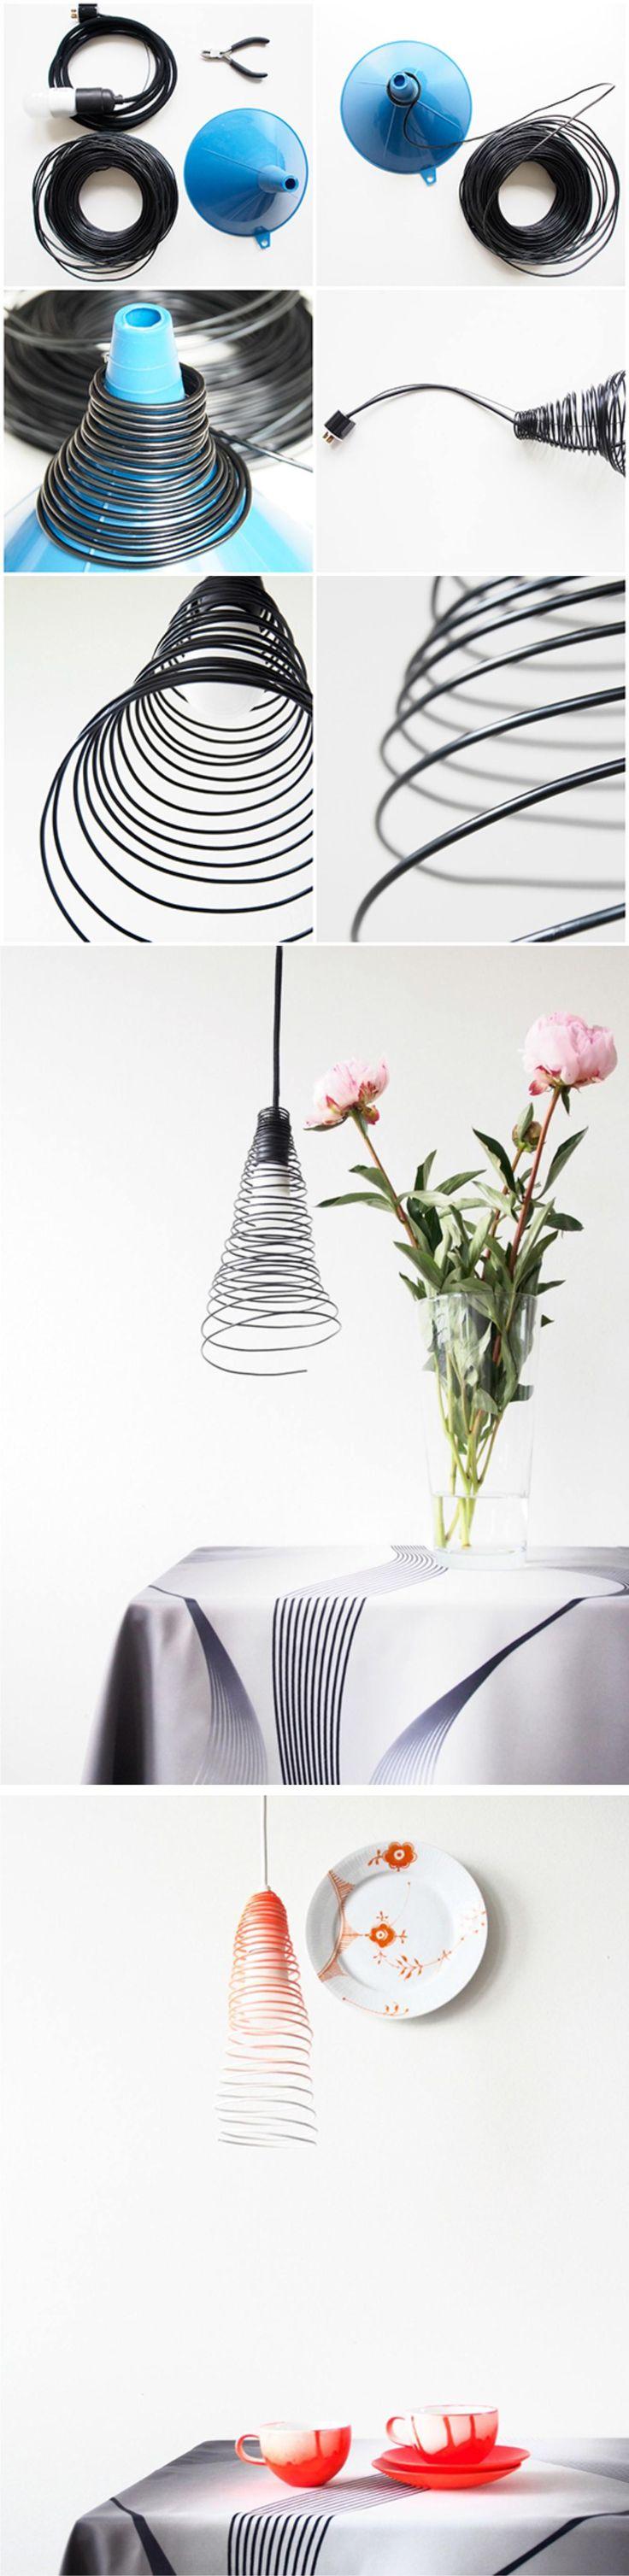 lampara alambre DIY muy ingenioso 2